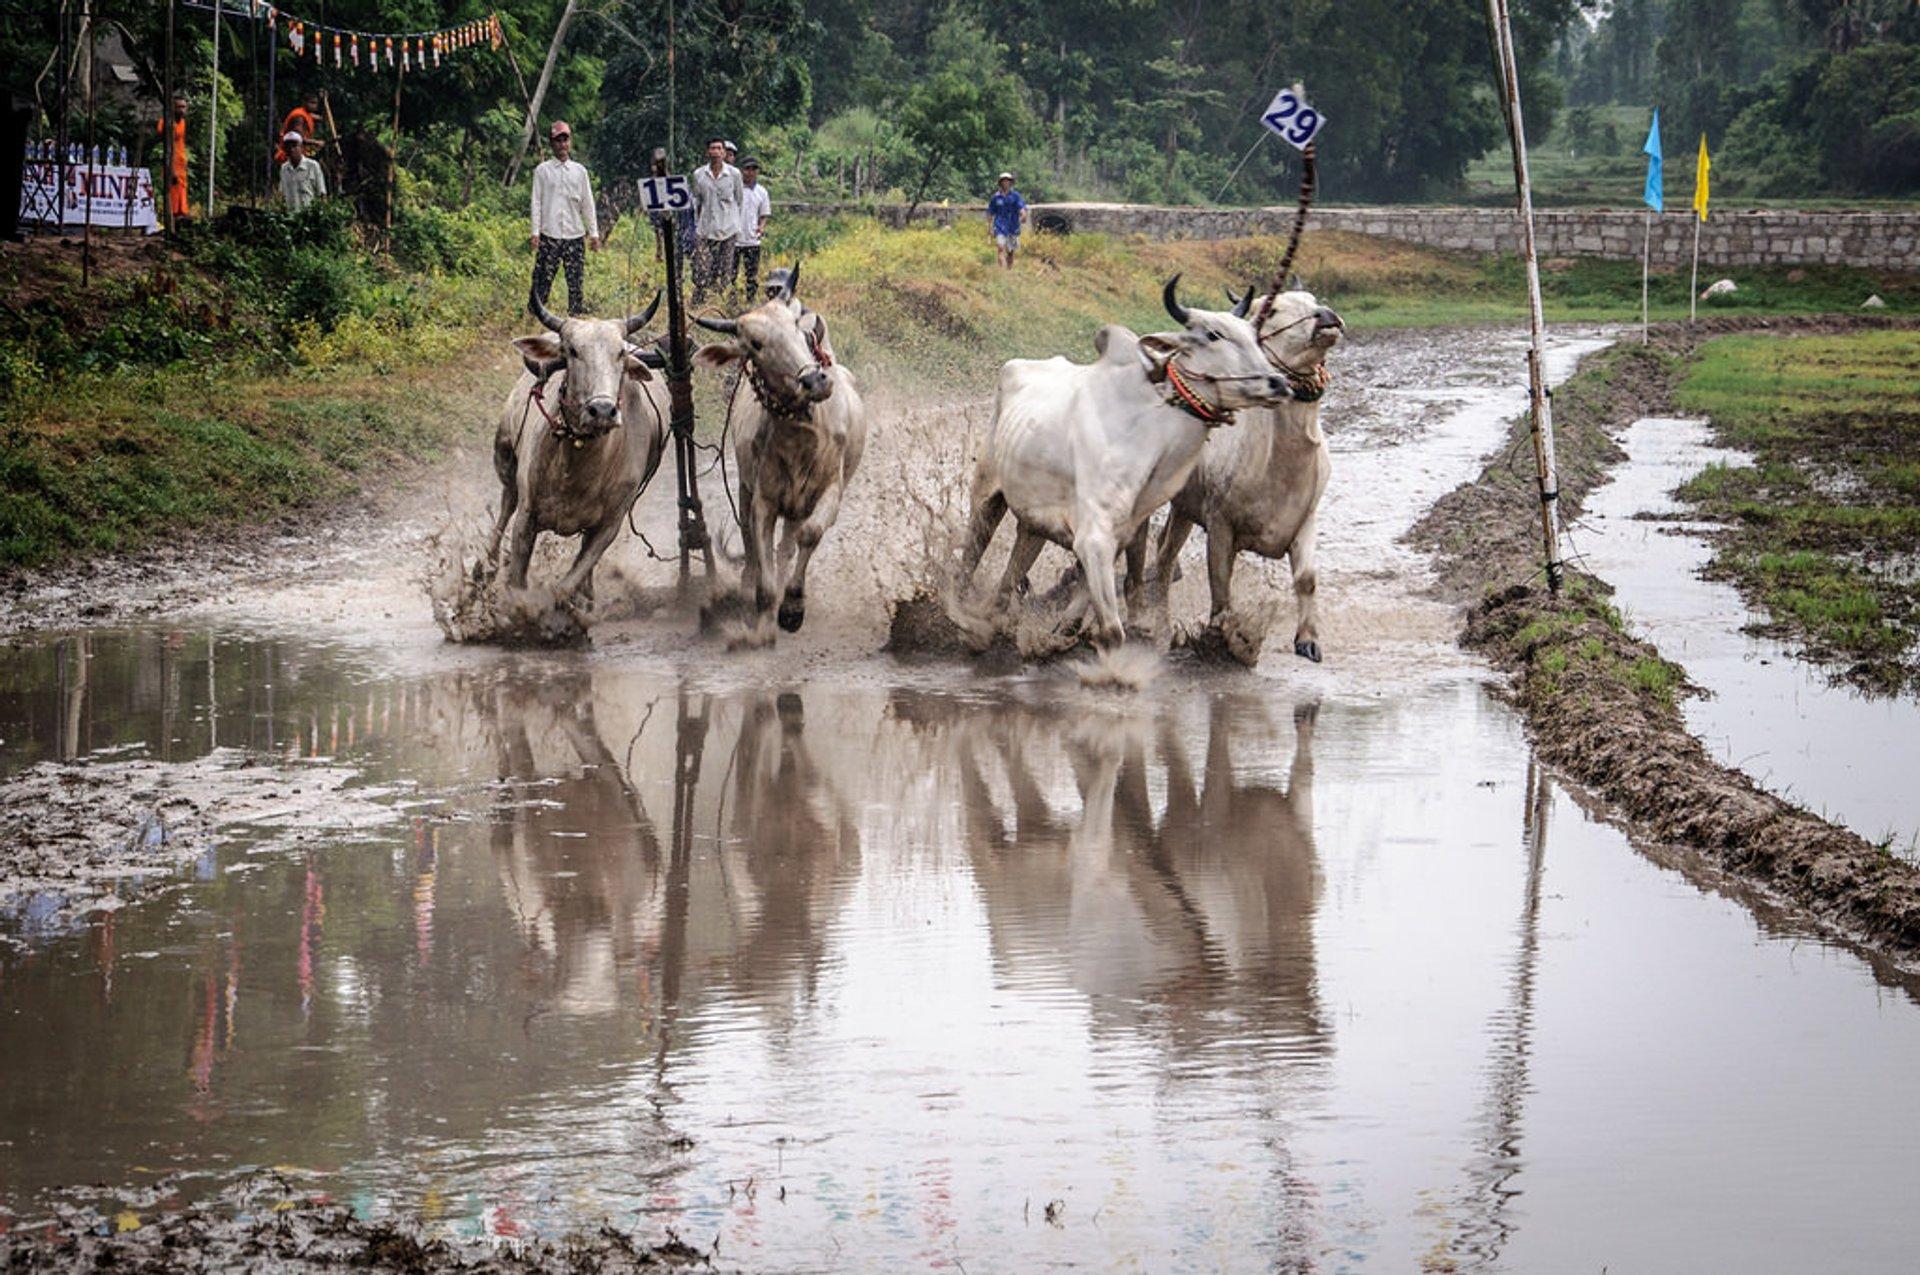 Cow Racing Festival in Vietnam - Best Season 2020